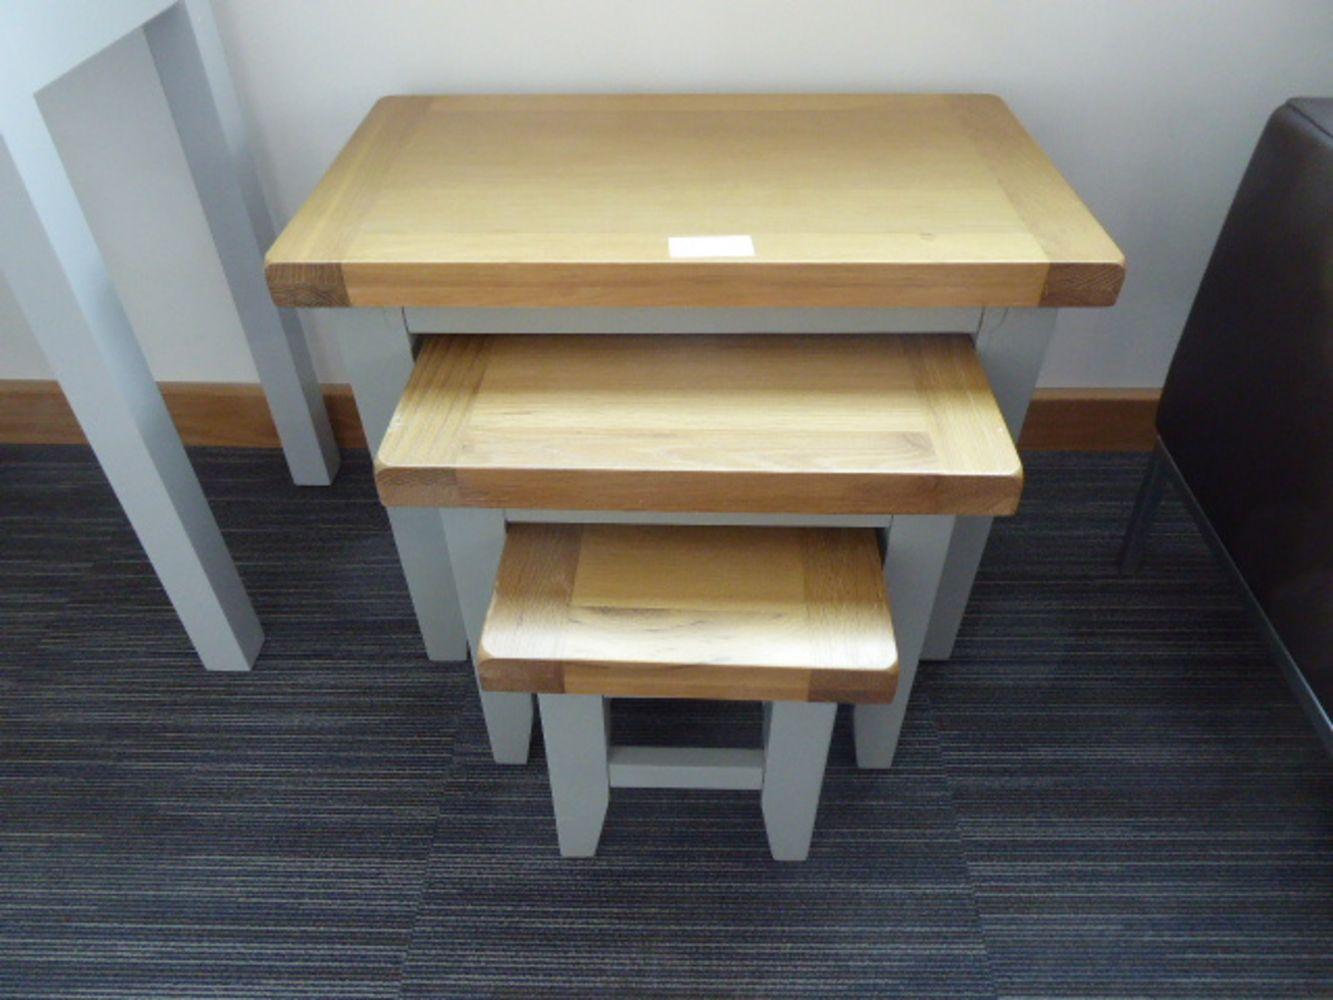 Saleroom 5 Furniture & Effects - Starting with Oak Furniture Sale 9.30am